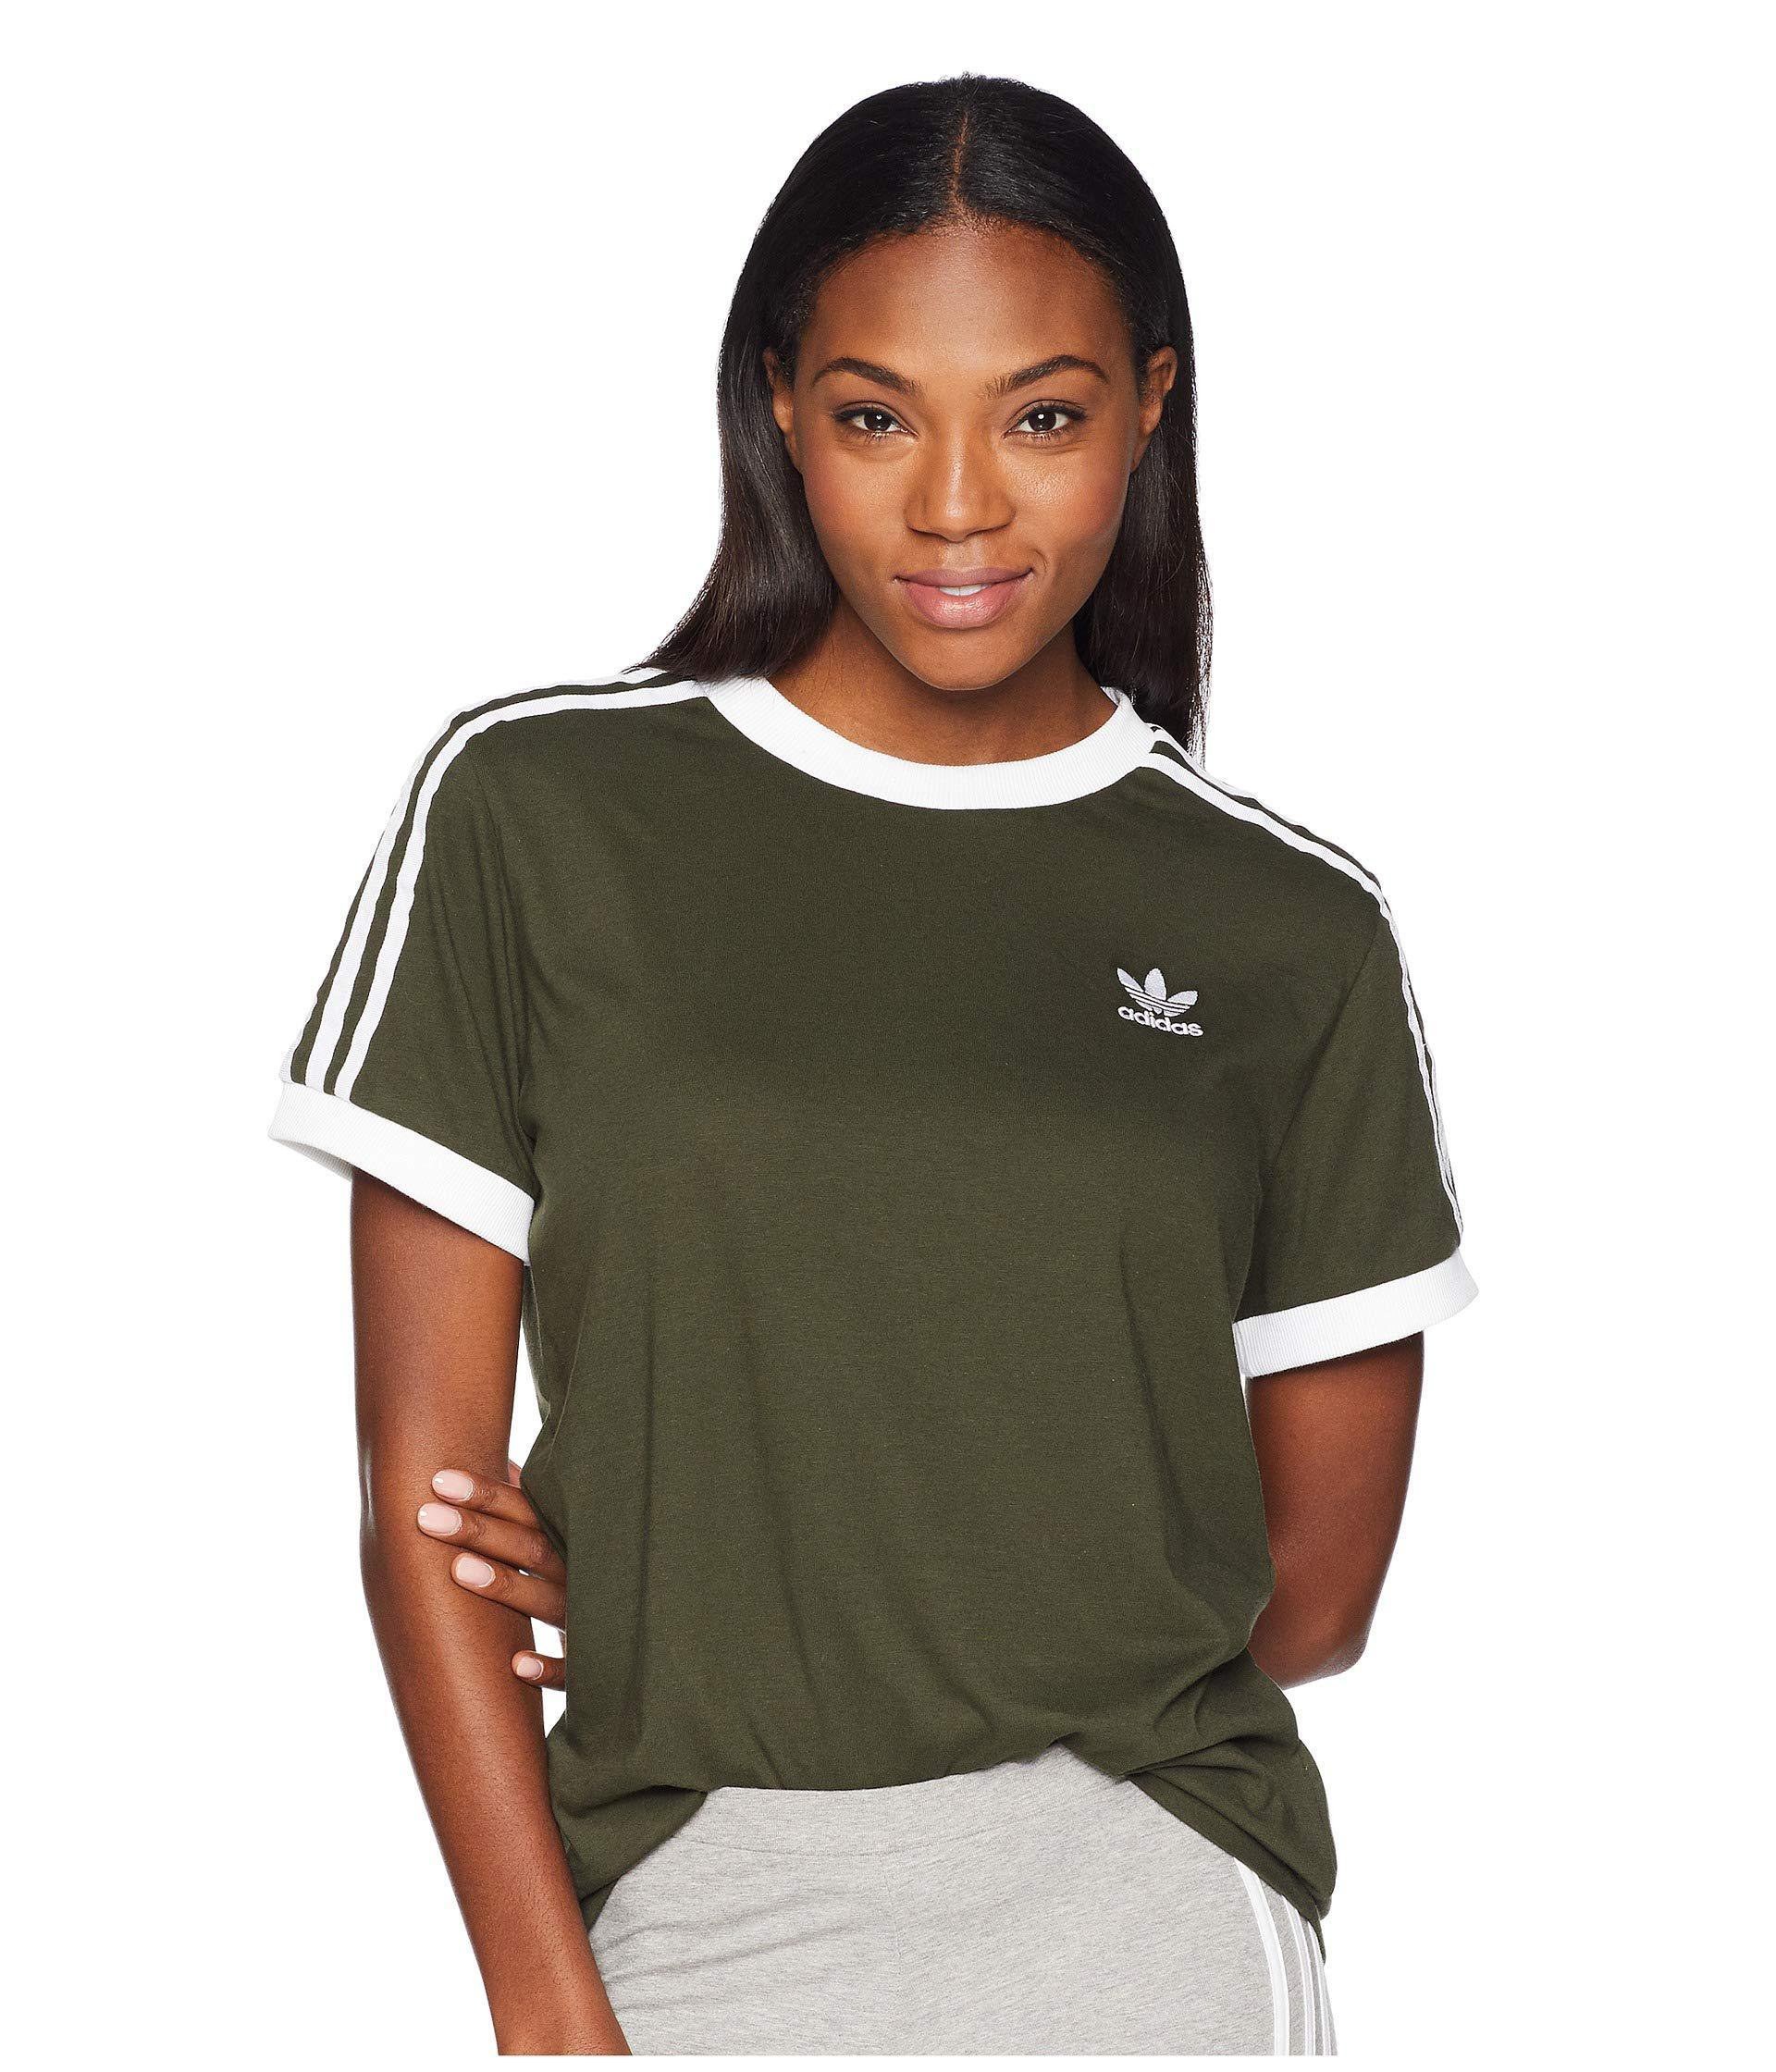 Lyst - adidas Originals 3 Stripes Tee (trace Maroon) Women s T Shirt ... 702a26e81